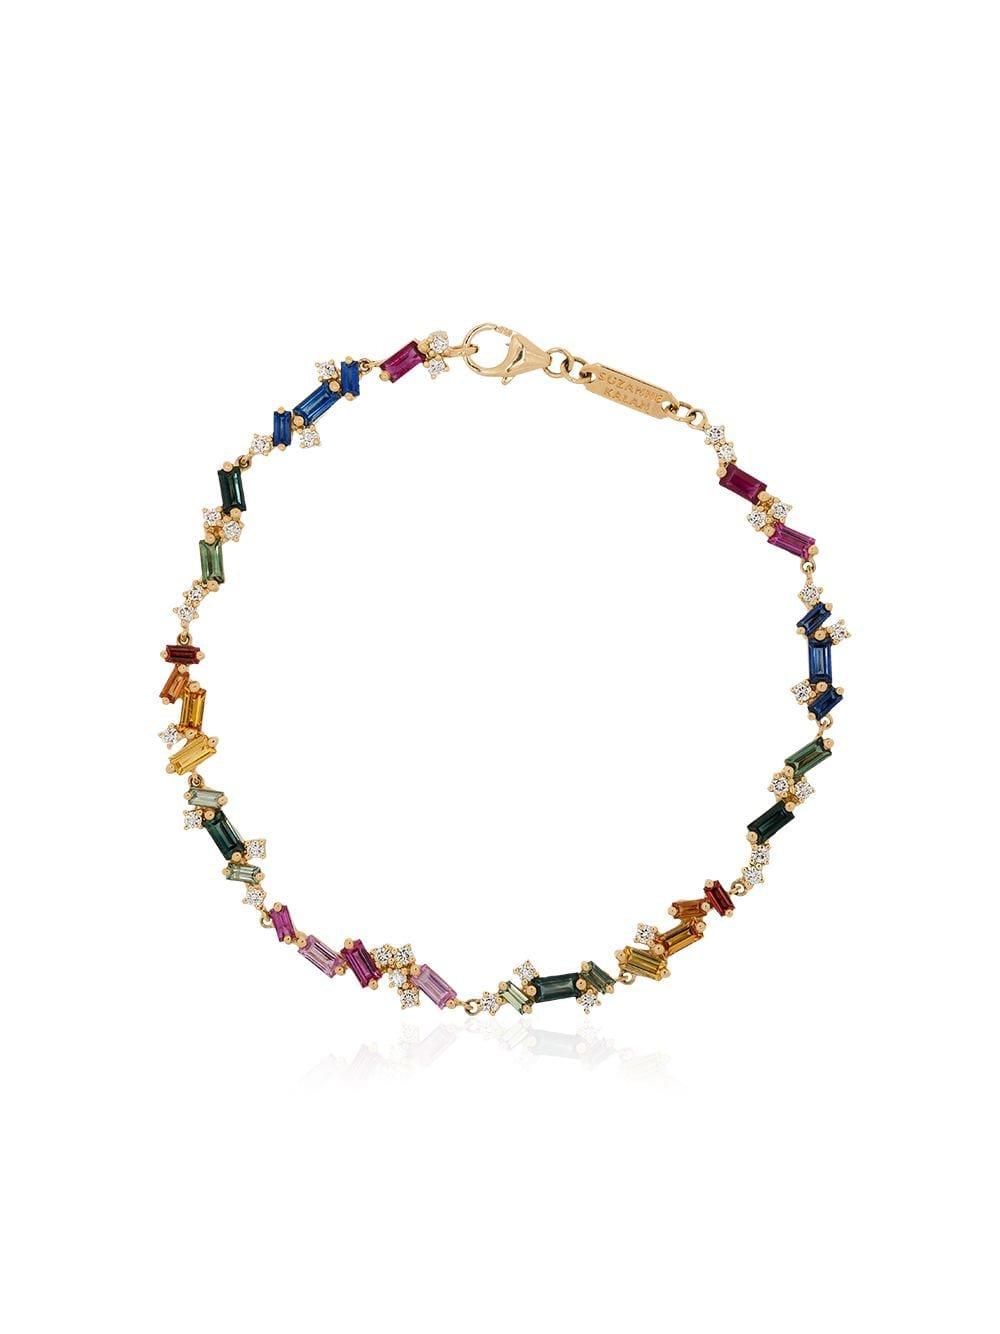 Suzanne Kalan 18Kt Yellow Gold Rainbow Bracelet | Farfetch.com